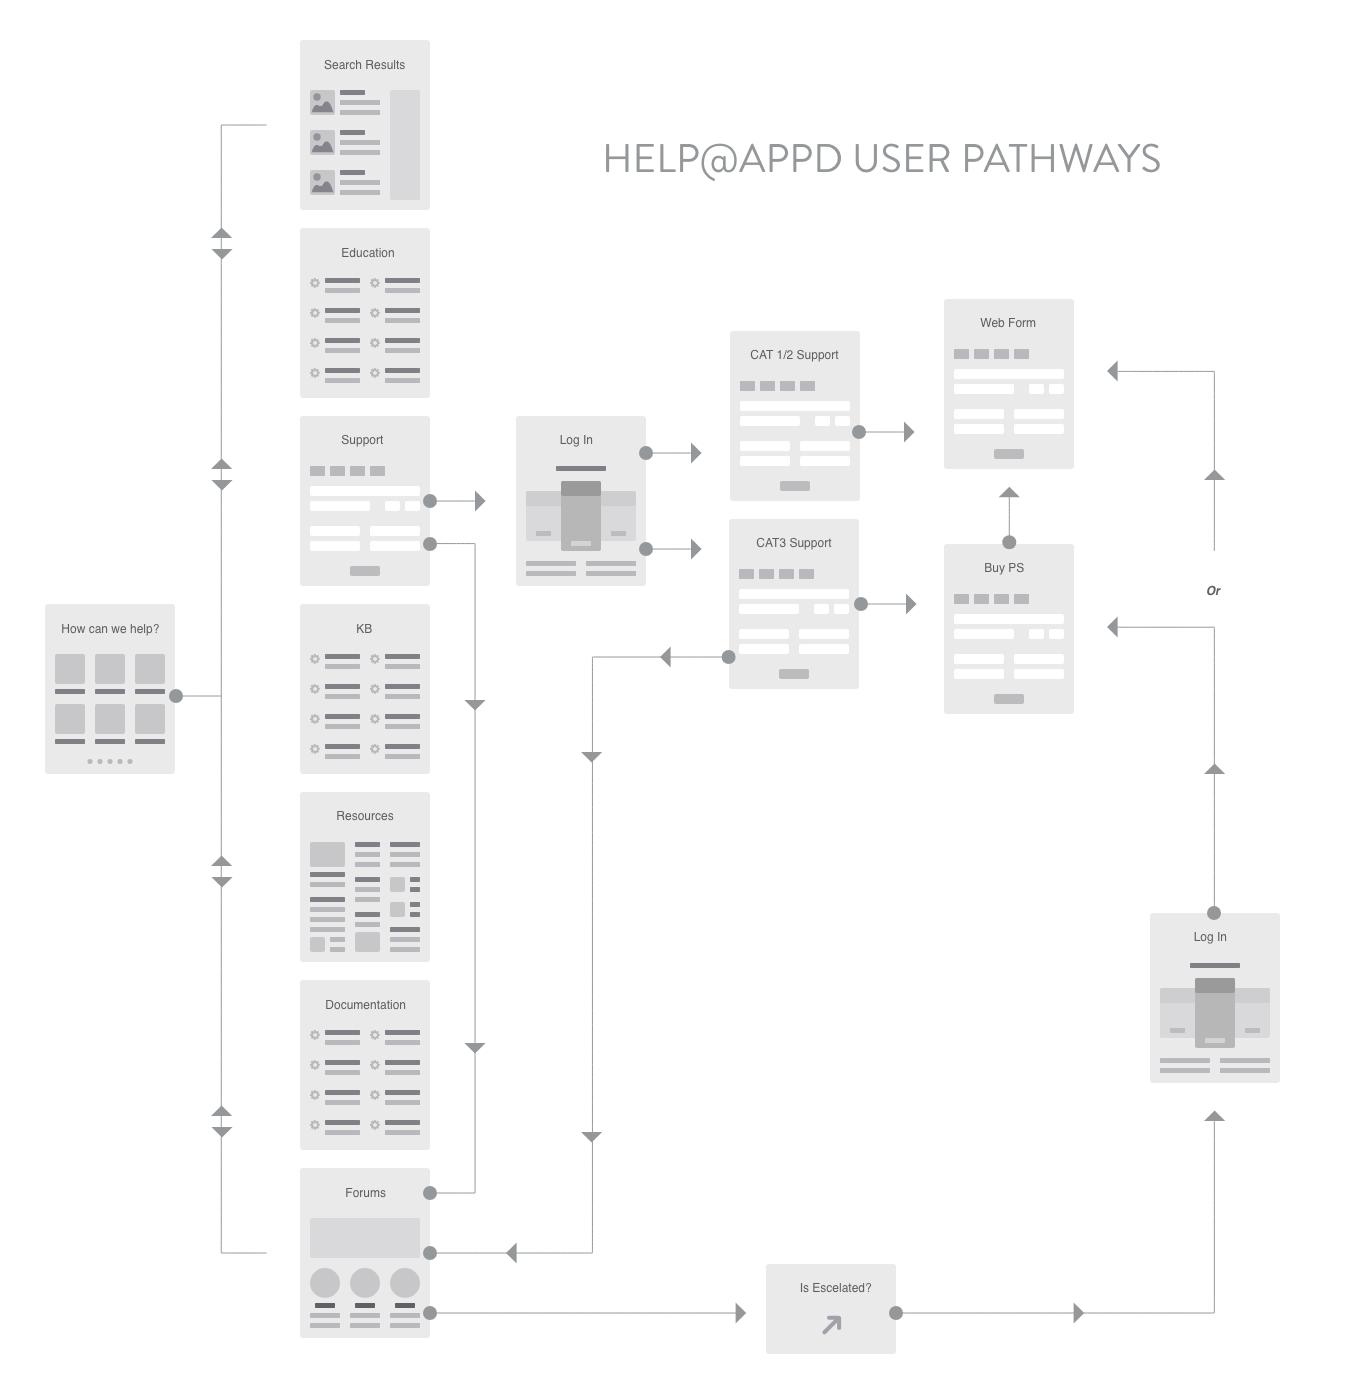 help@appd_user_pathways_v1.png